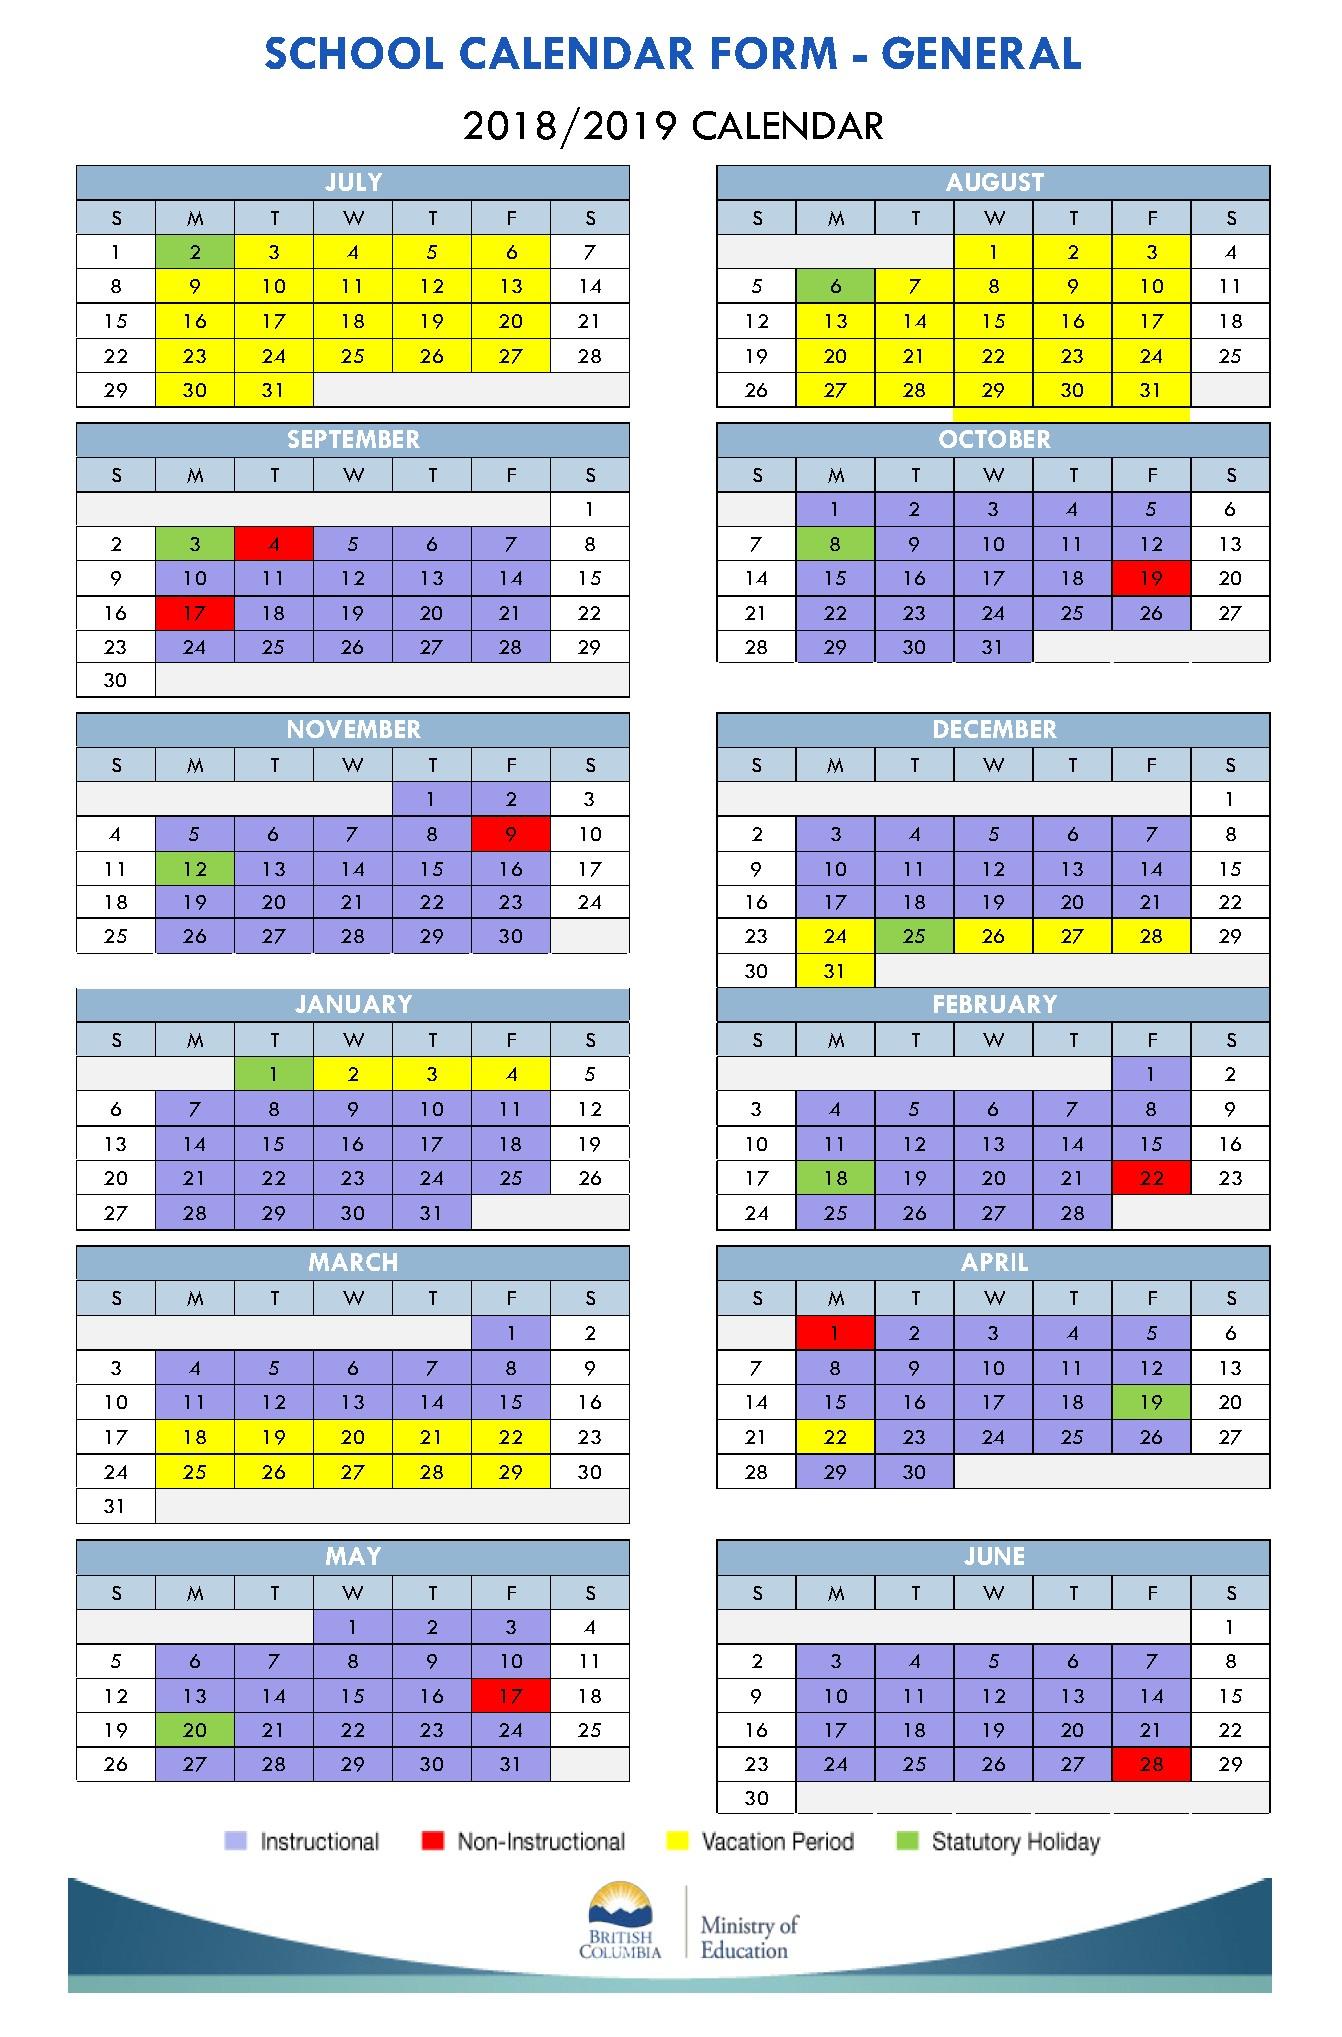 DistrictCalendar2018 2019 Amended Page 1 2018 2019 revised School Calendar